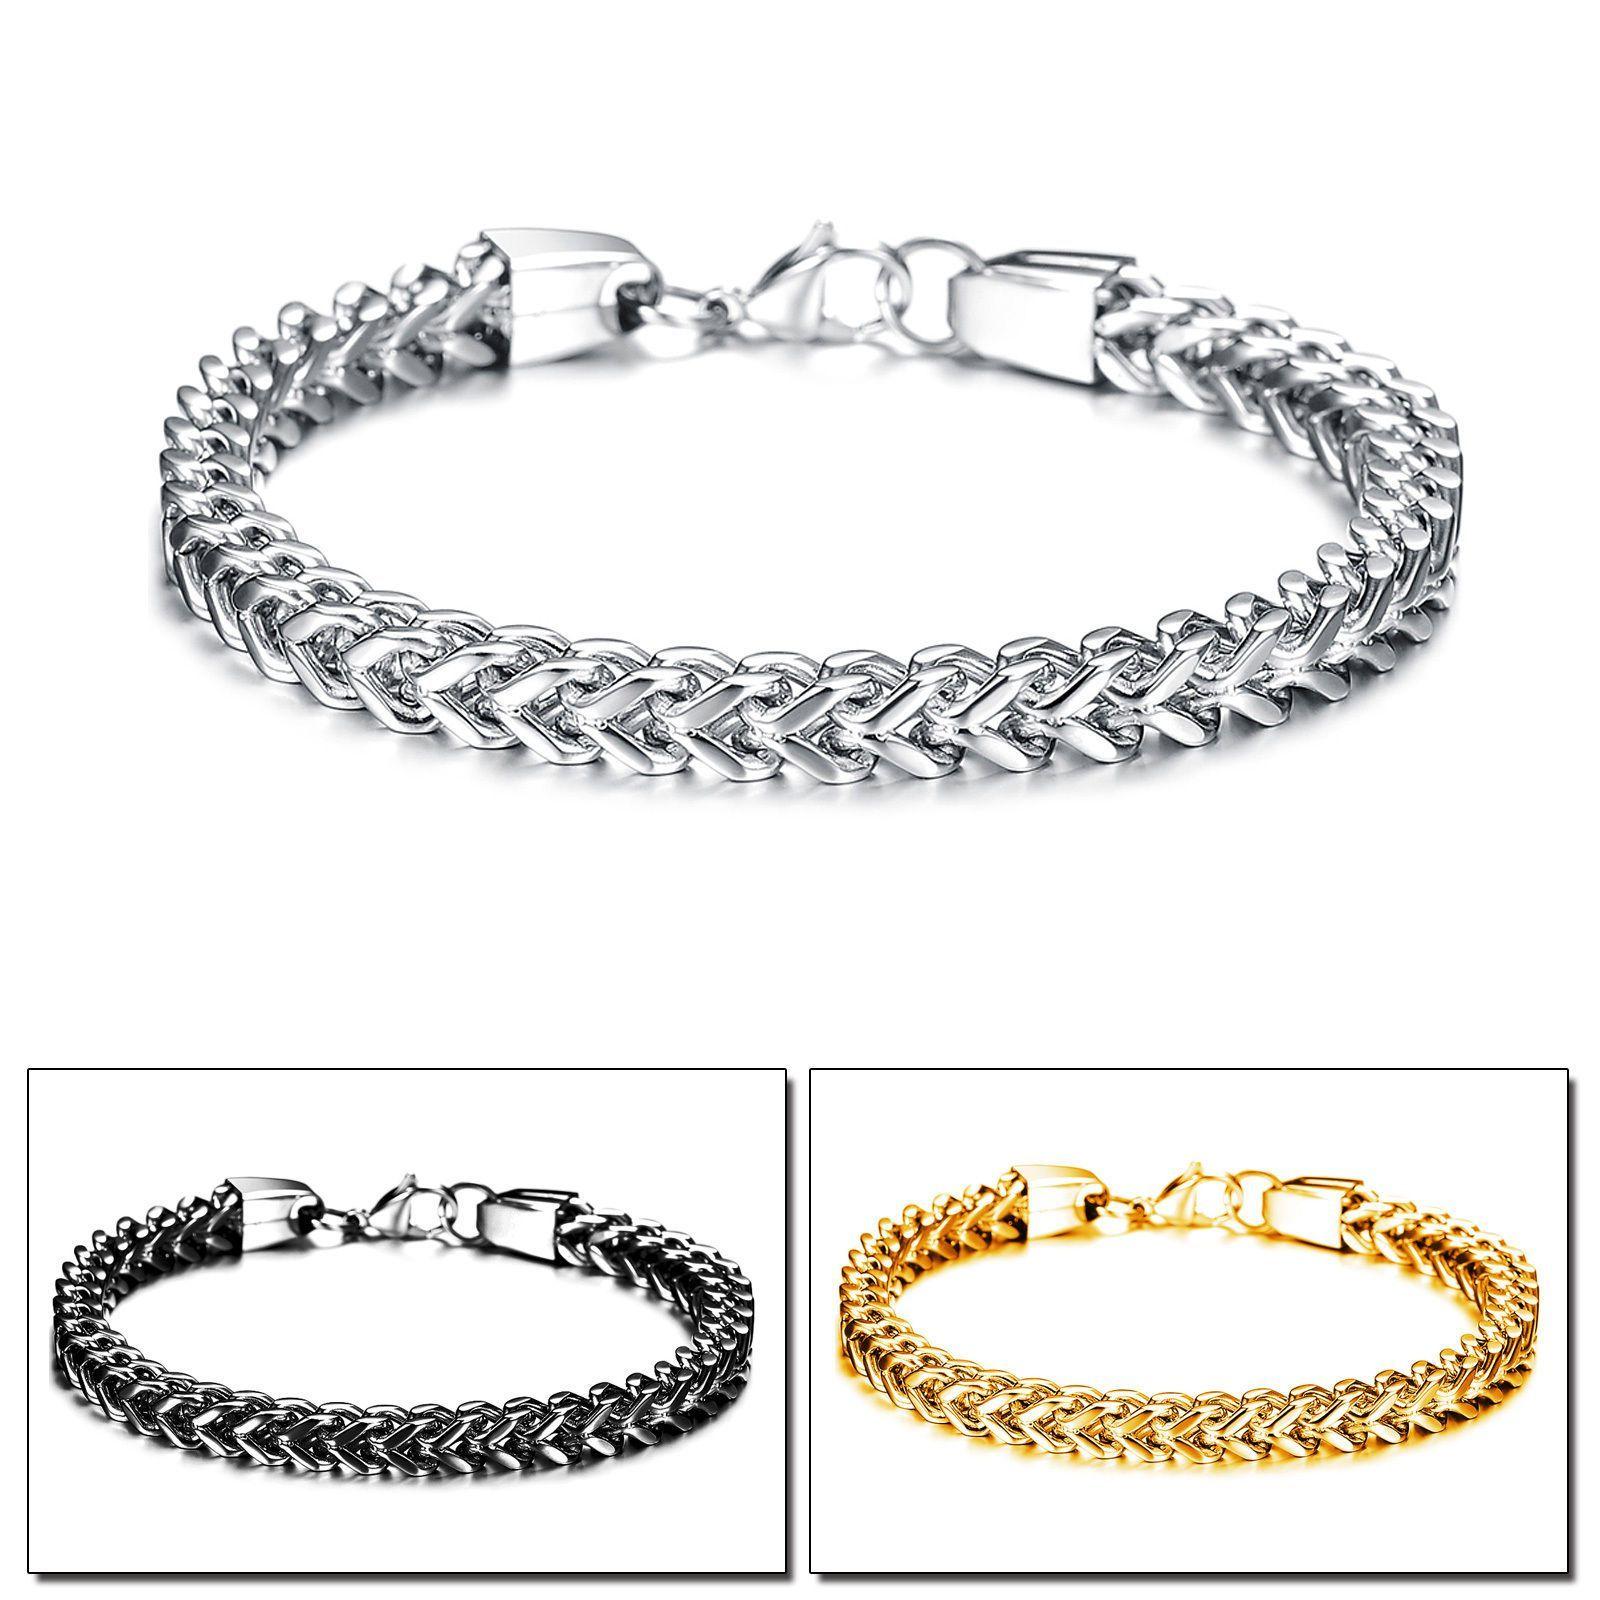 Xmasu gift for women men jewelry figaro box curb chain bracelet